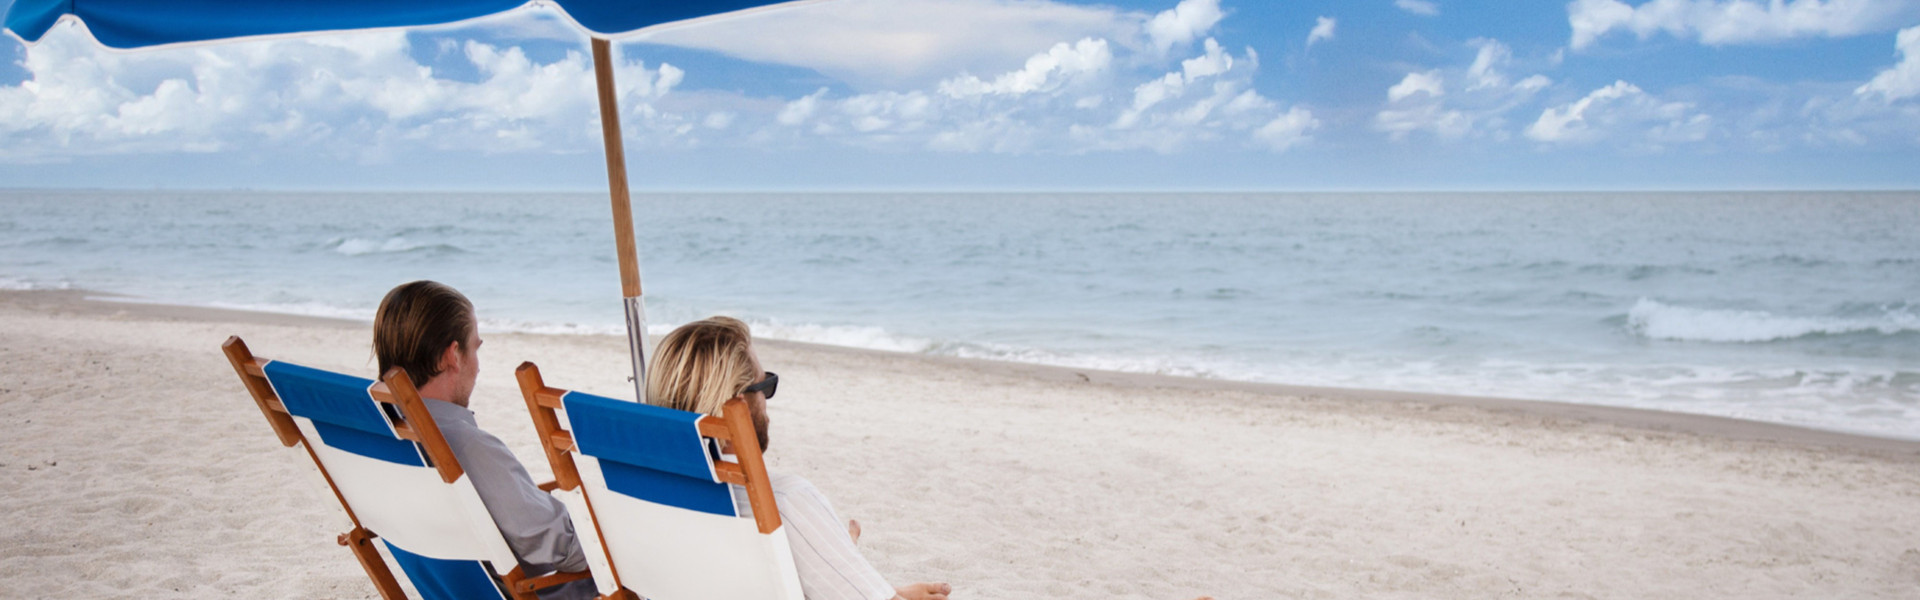 Westgate Cocoa Beach Resort in Cocoa Beach FL is the best place to be in Cocoa Beach | Westgate Coca Beach Resort